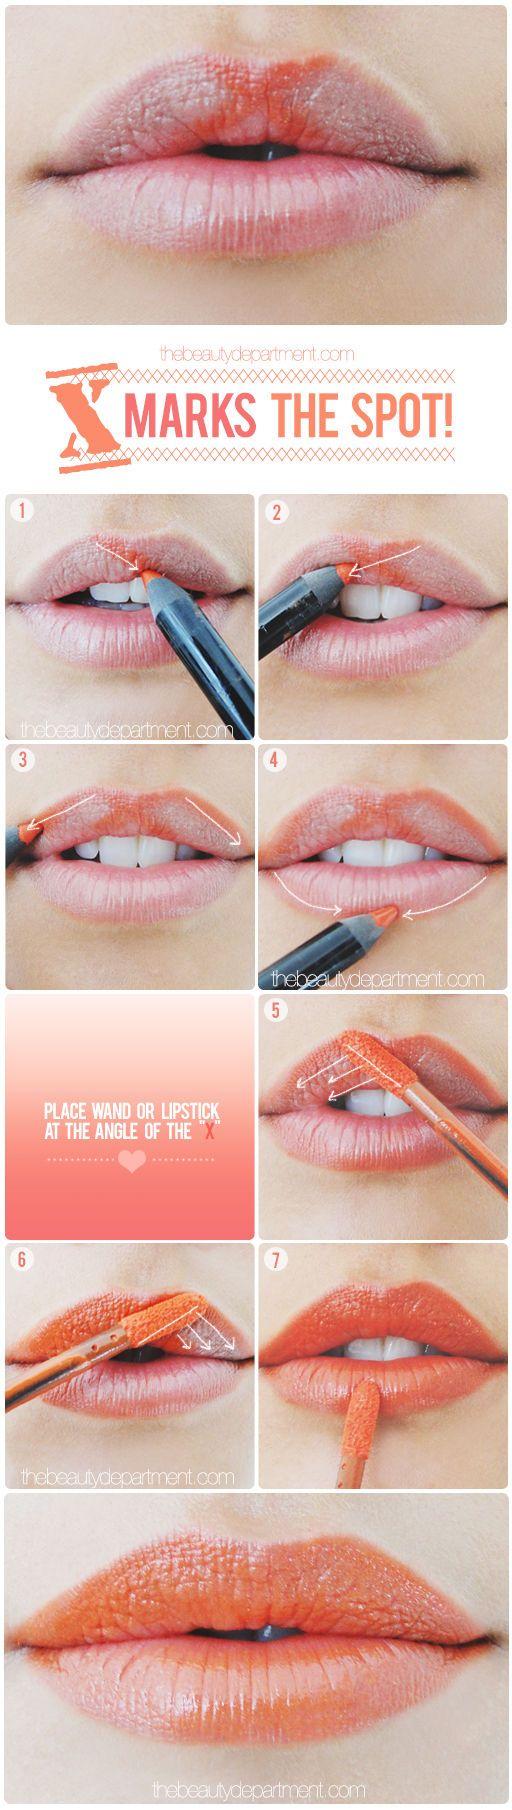 Como contornar os lábios